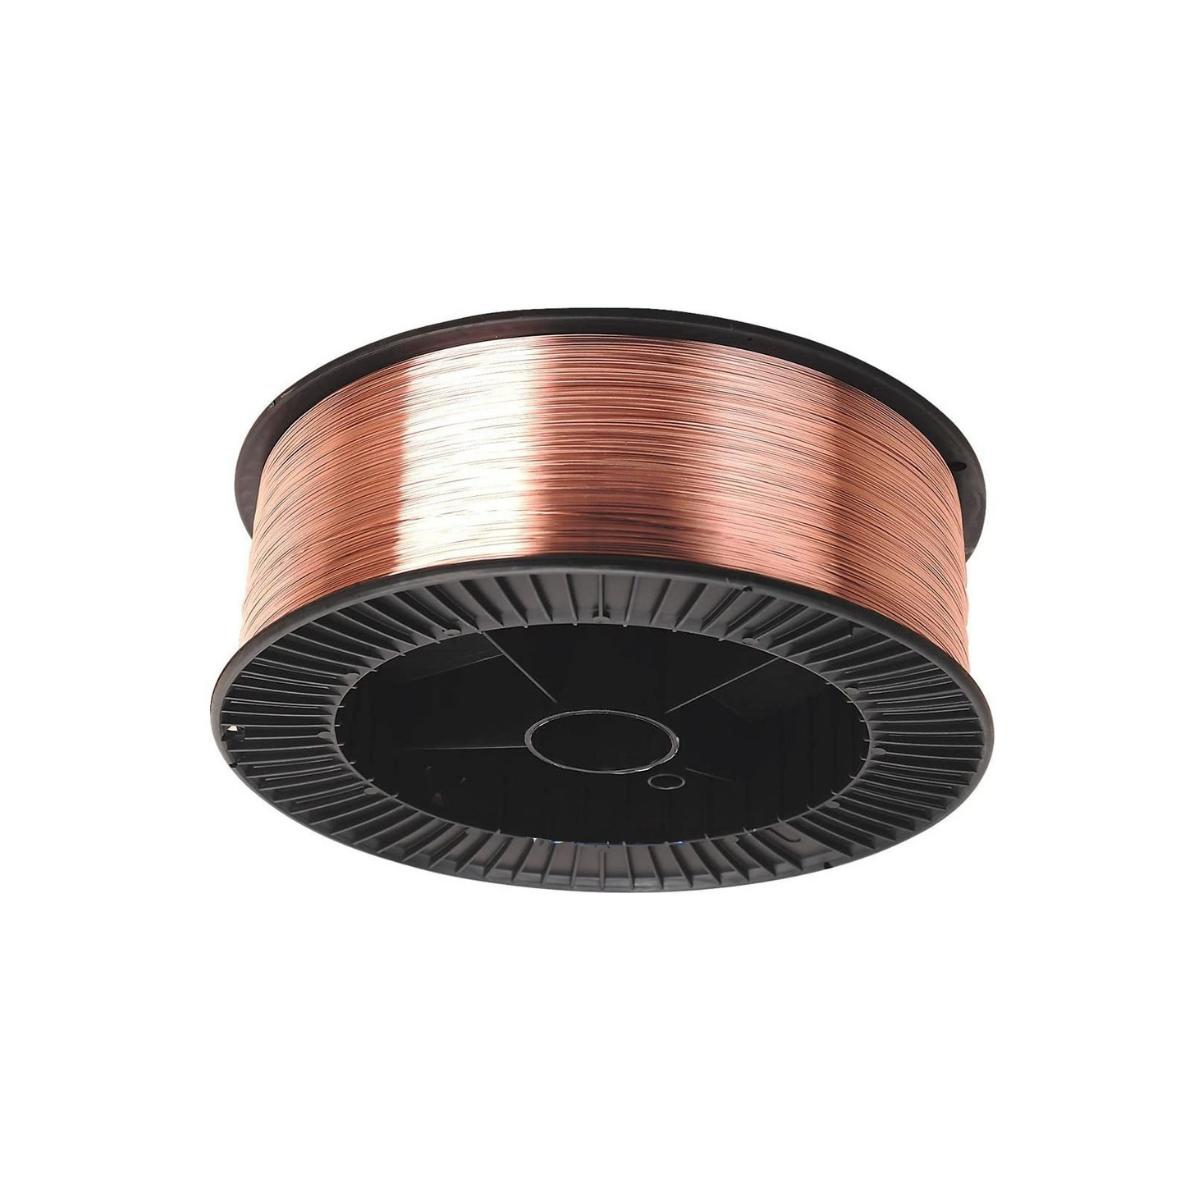 SWP 0.8mm MIG Wire 5kg 7304   For Welding Mild - Medium Tensile Steels   toolforce.ie